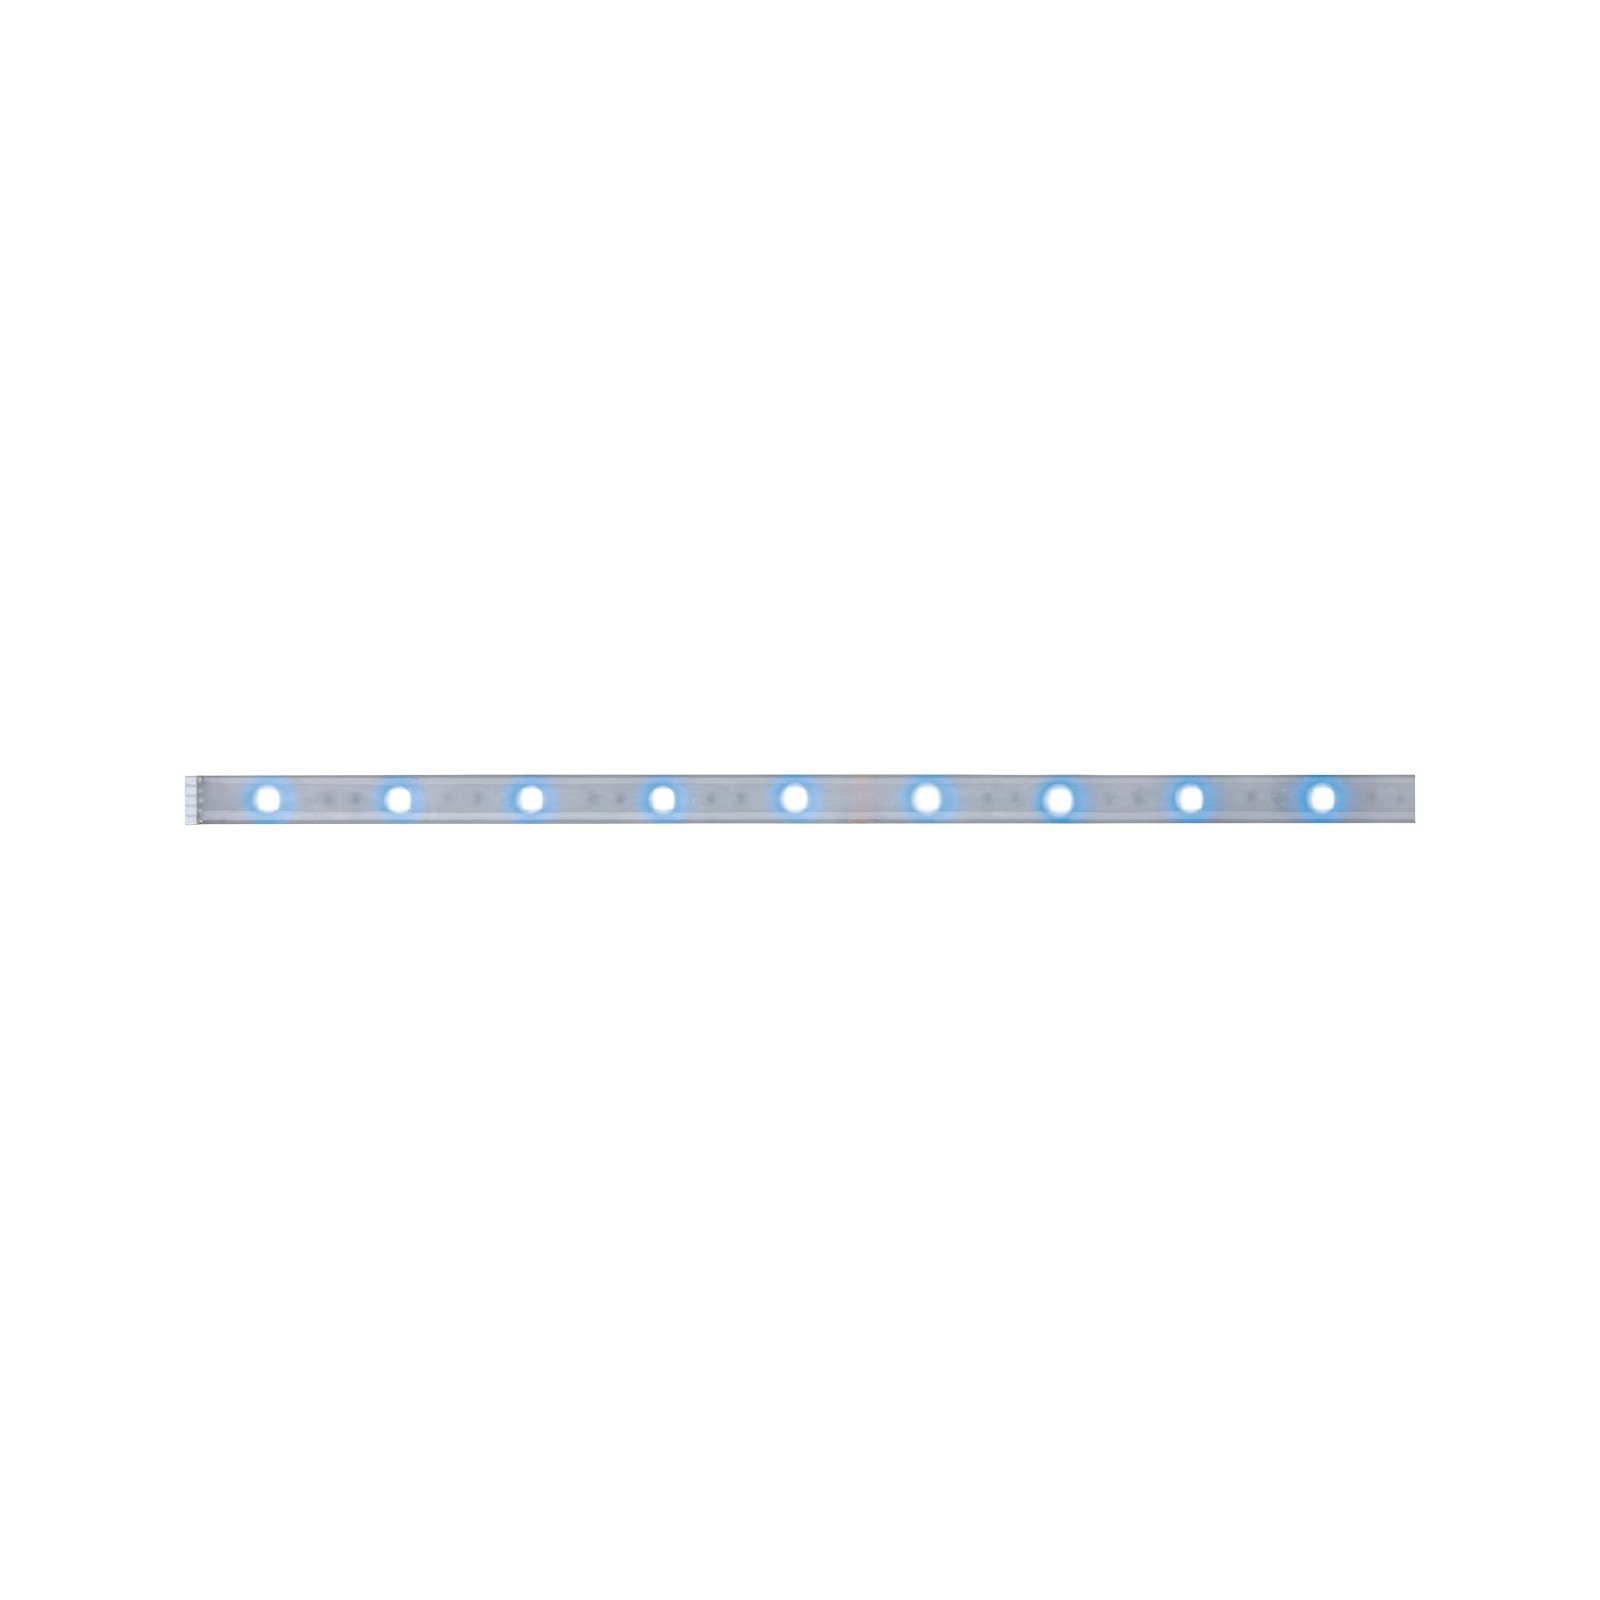 MaxLED 250 LED Strip RGBW 1m gecoat IP44 7W 270lm RGBW